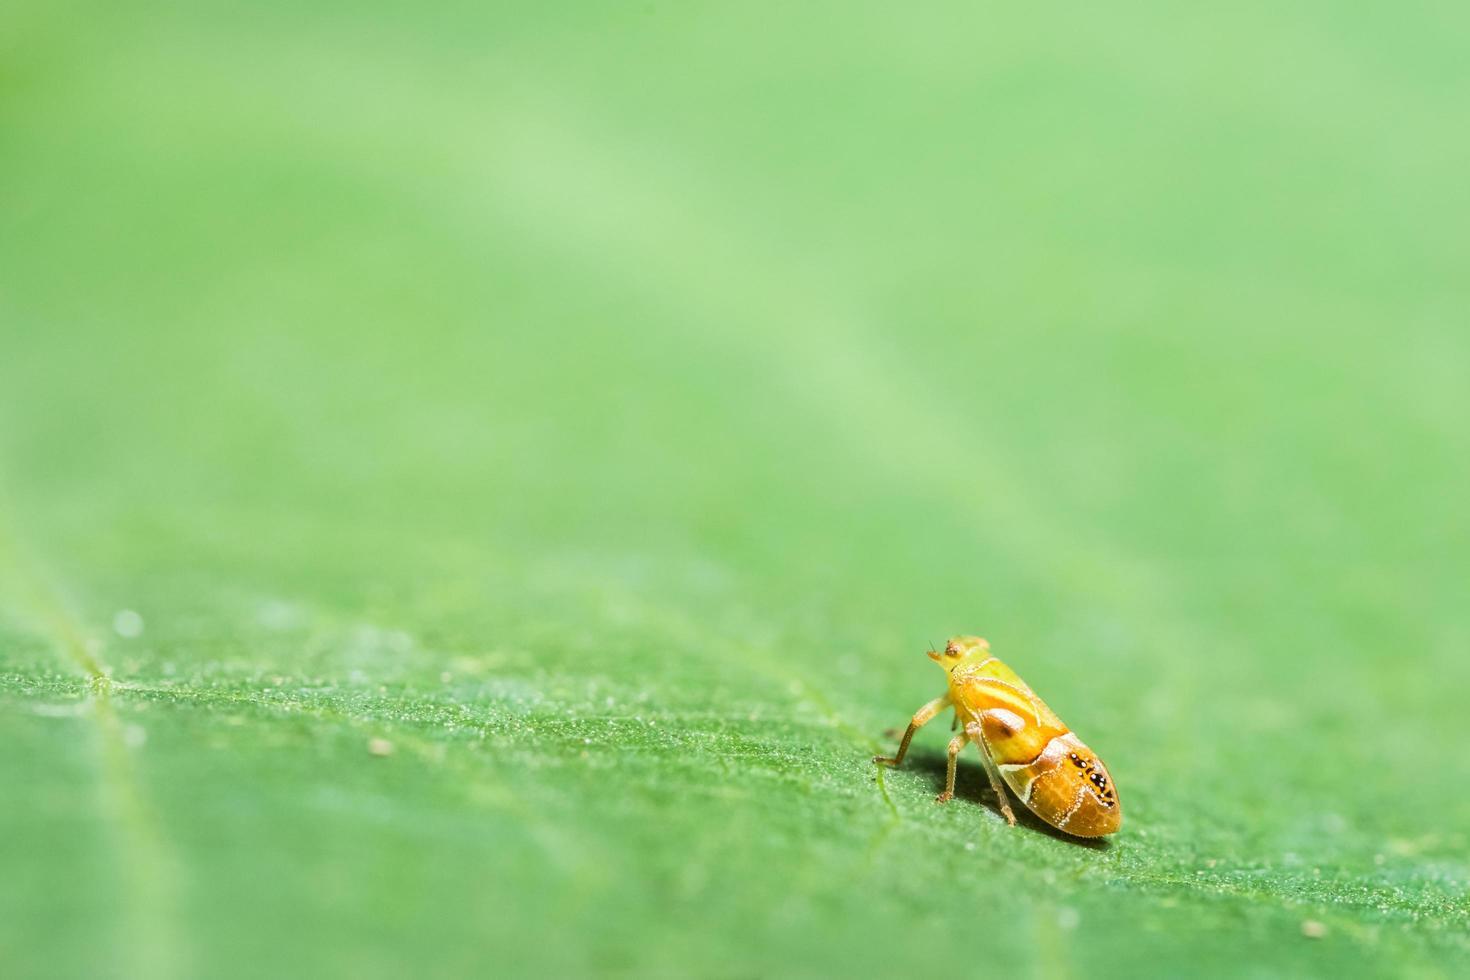 saltahojas insecto cruza hoja foto